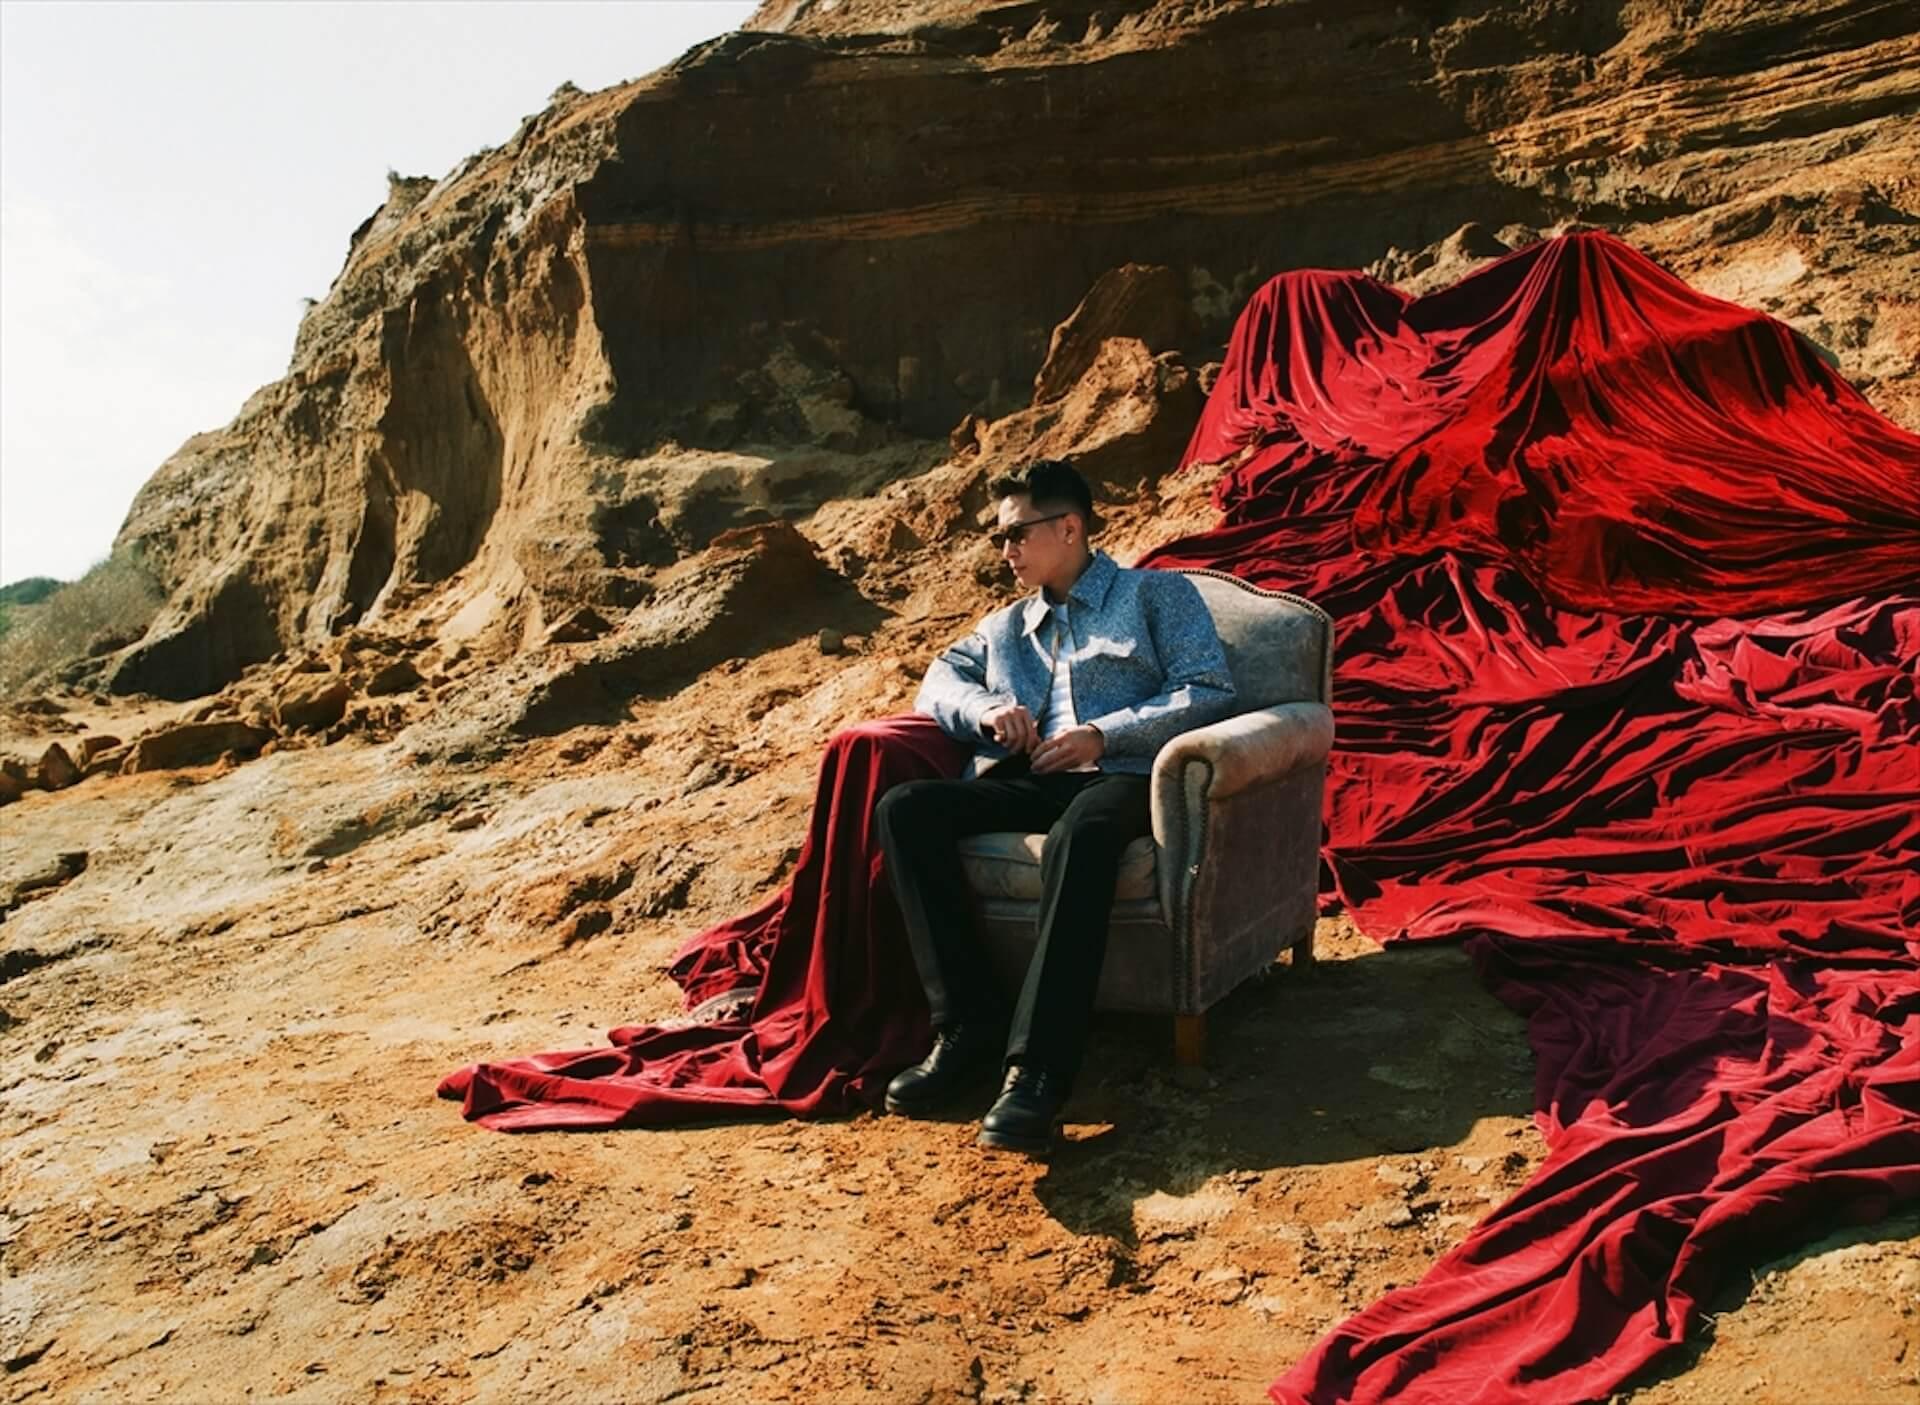 "KANDYTOWN・KEIJUのニューアルバム『T.A.T.O.』収録曲""I Get Lonely""が先行配信スタート フォローキャンペーンも開始 music200715_keiju_2"